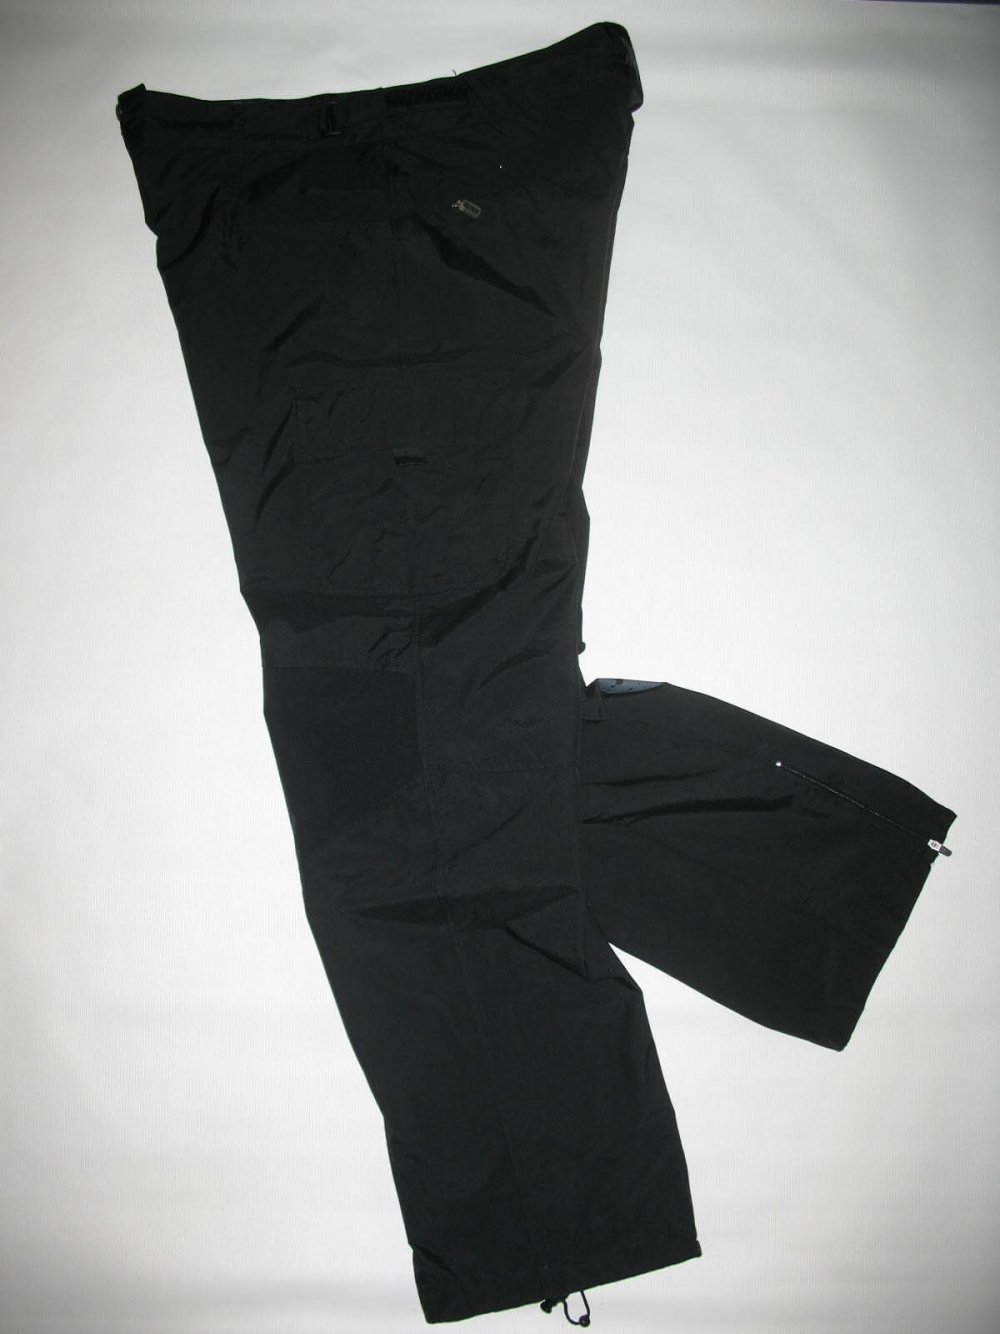 Штаны IXS bc-elite hurtle bike pants (размер XL) - 3